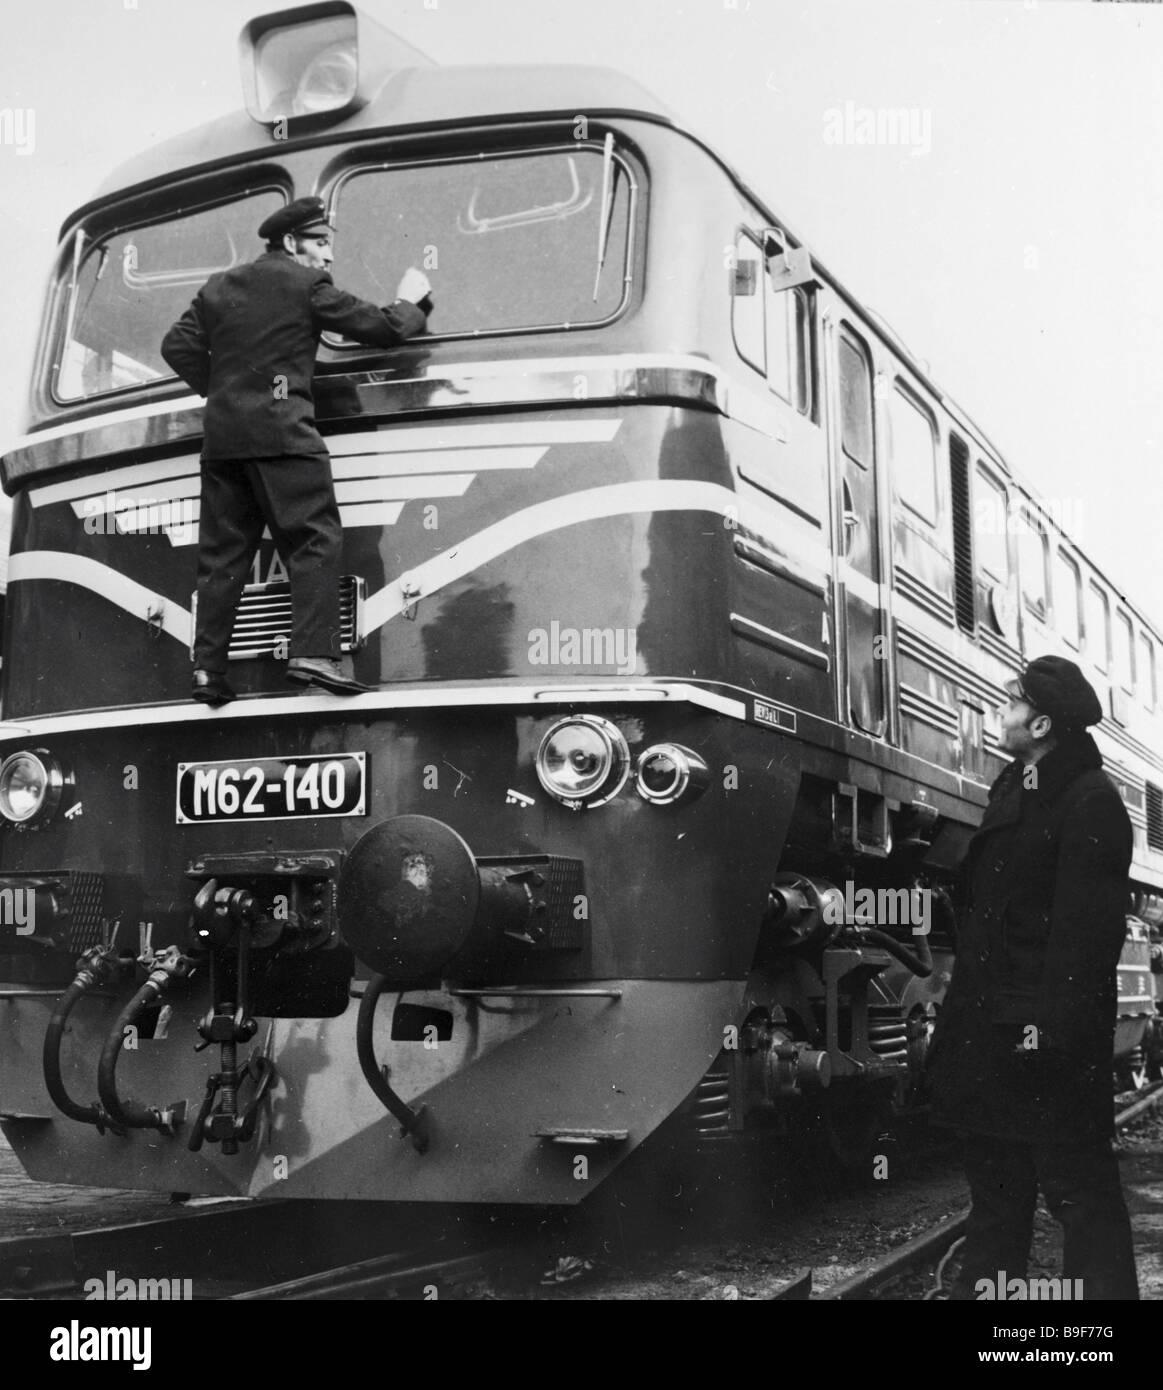 Soviet diesel locomotive - Stock Image